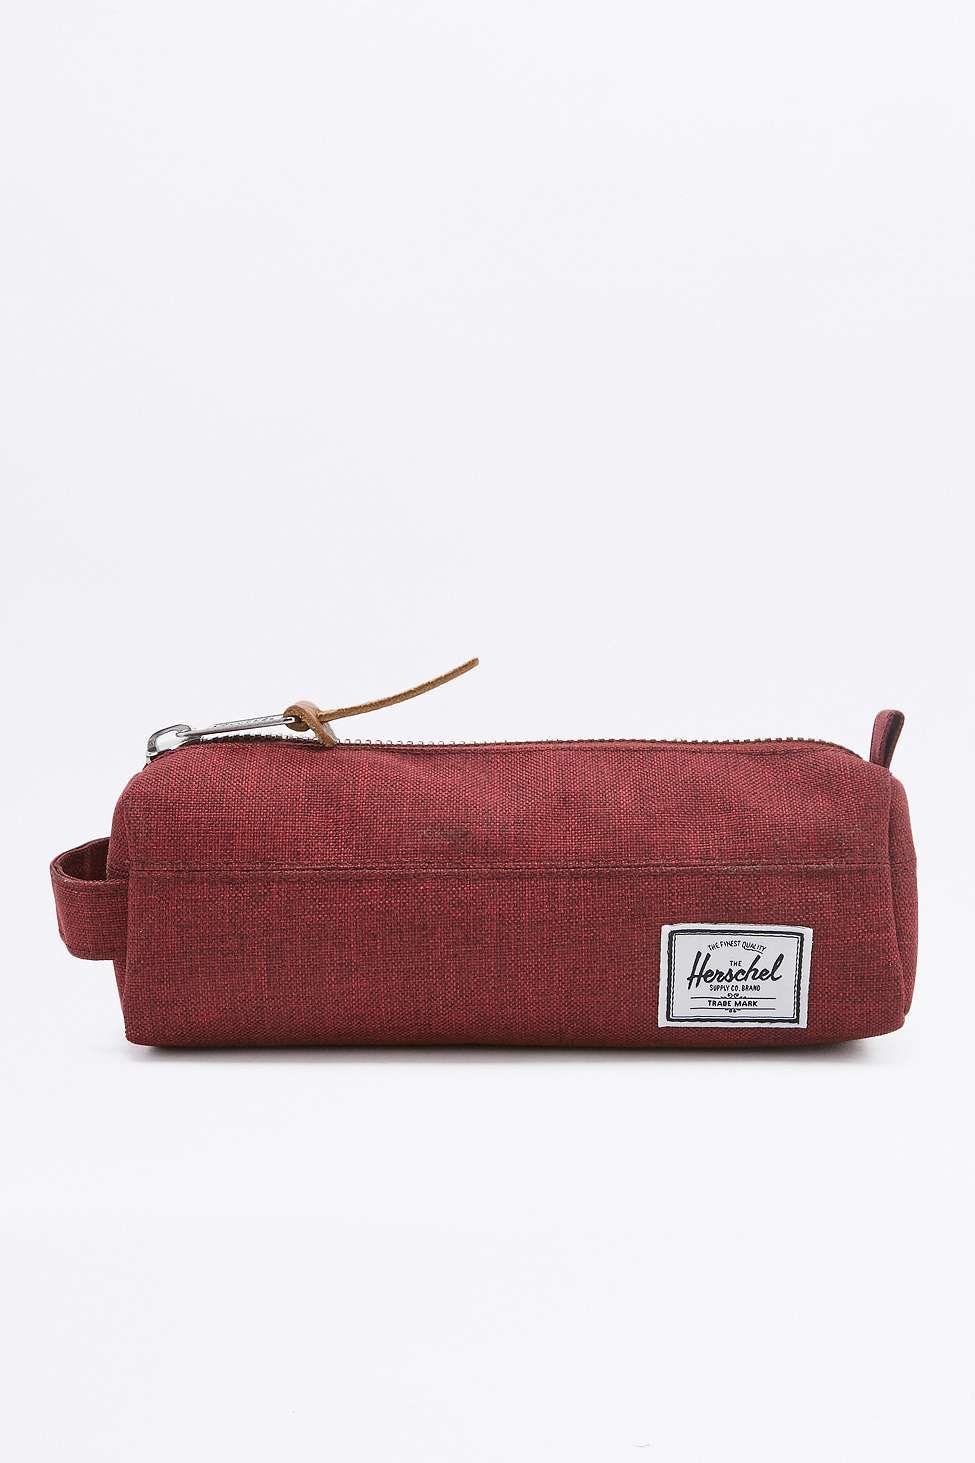 3e1a8b75823f Herschel Supply co. Settlement Wine Tasting Maroon Pencil Case ...